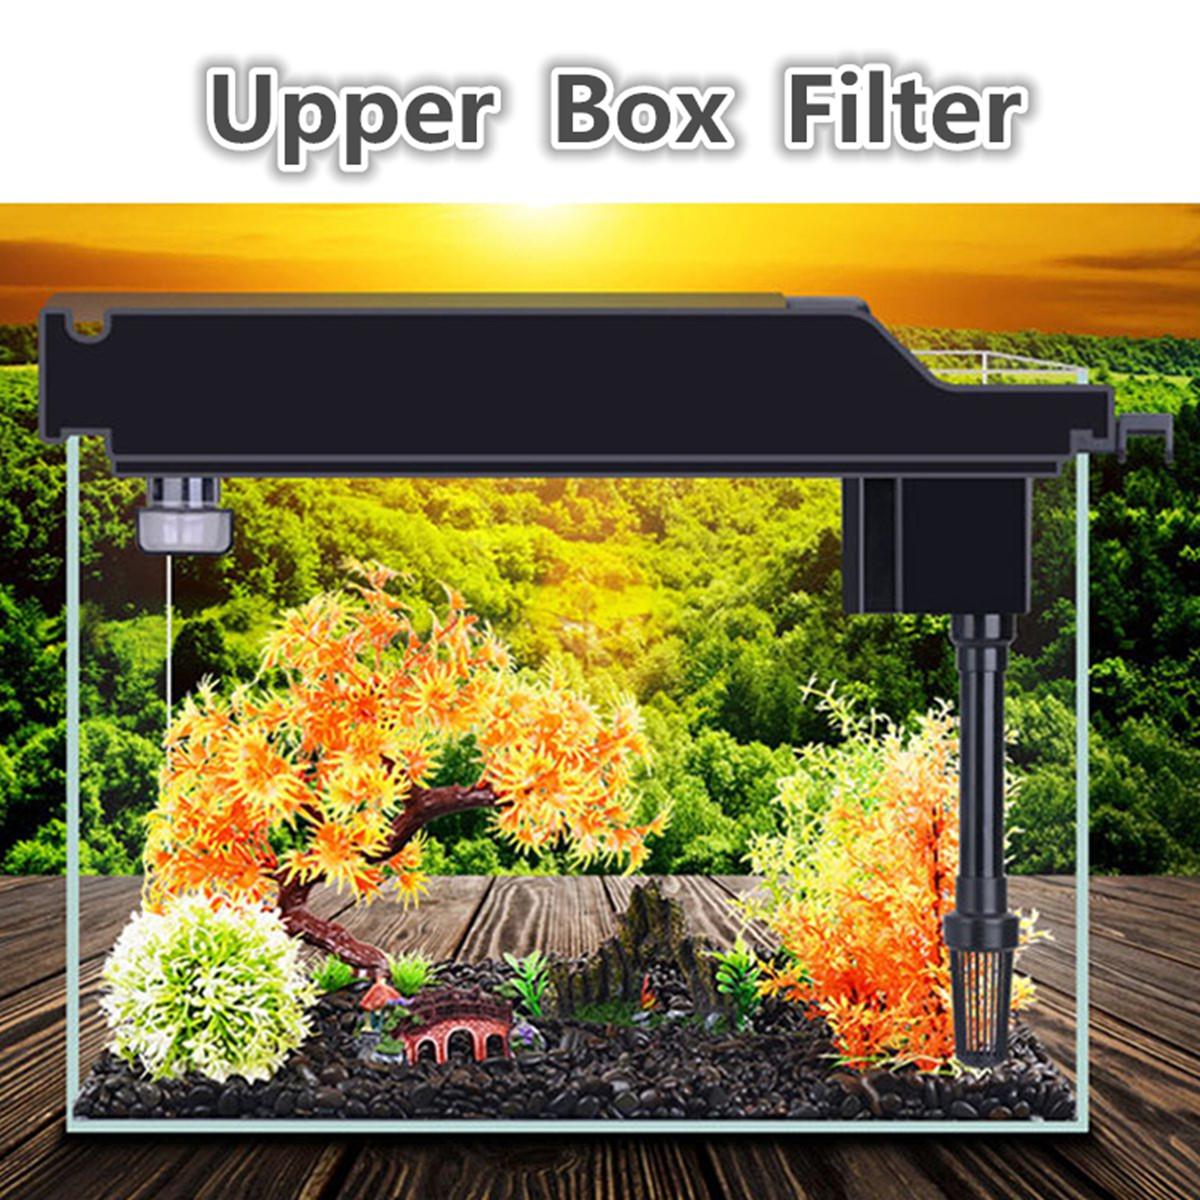 Meigar 3-in-1 Upper Box Filter Fish tank Filter Aquarium External Tank Filter Cleaning and Maintenance of Fresh and Salt Water